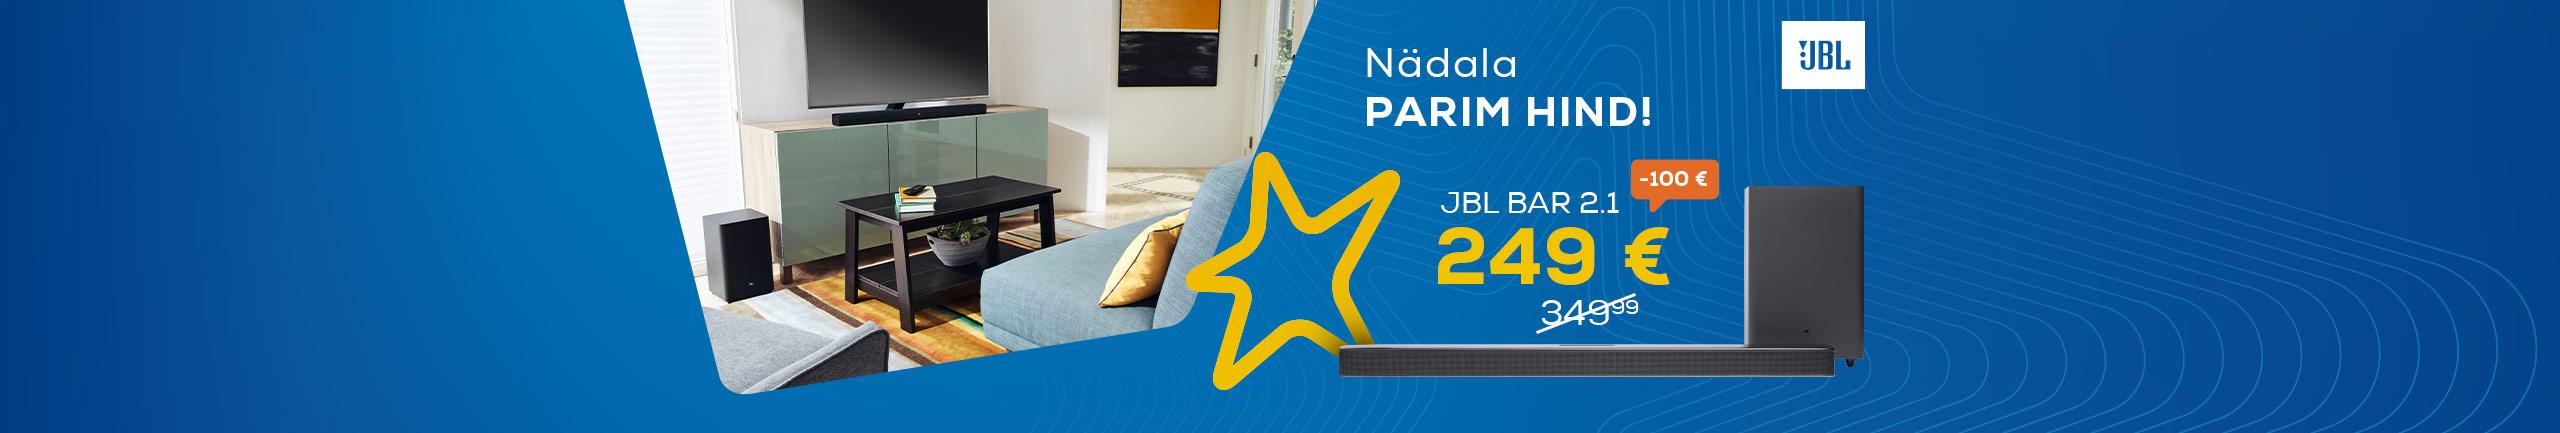 FPS Nädala parim hind! JBL Soundbar 2.1